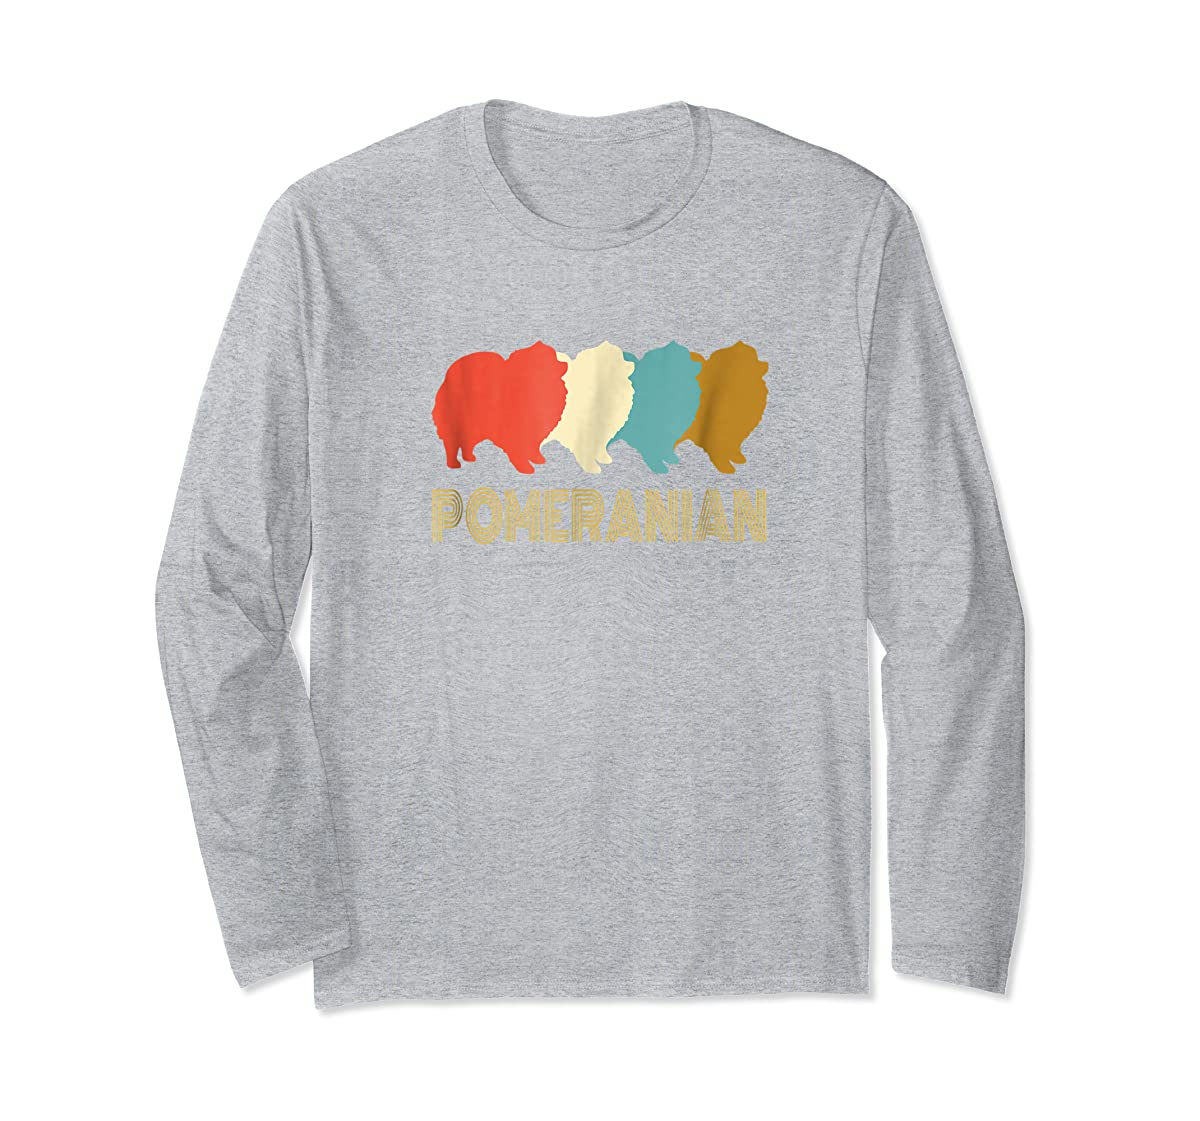 Vintage Pomeranian T-shirt, I Love My Pomeranian-Long Sleeve-Sport Grey